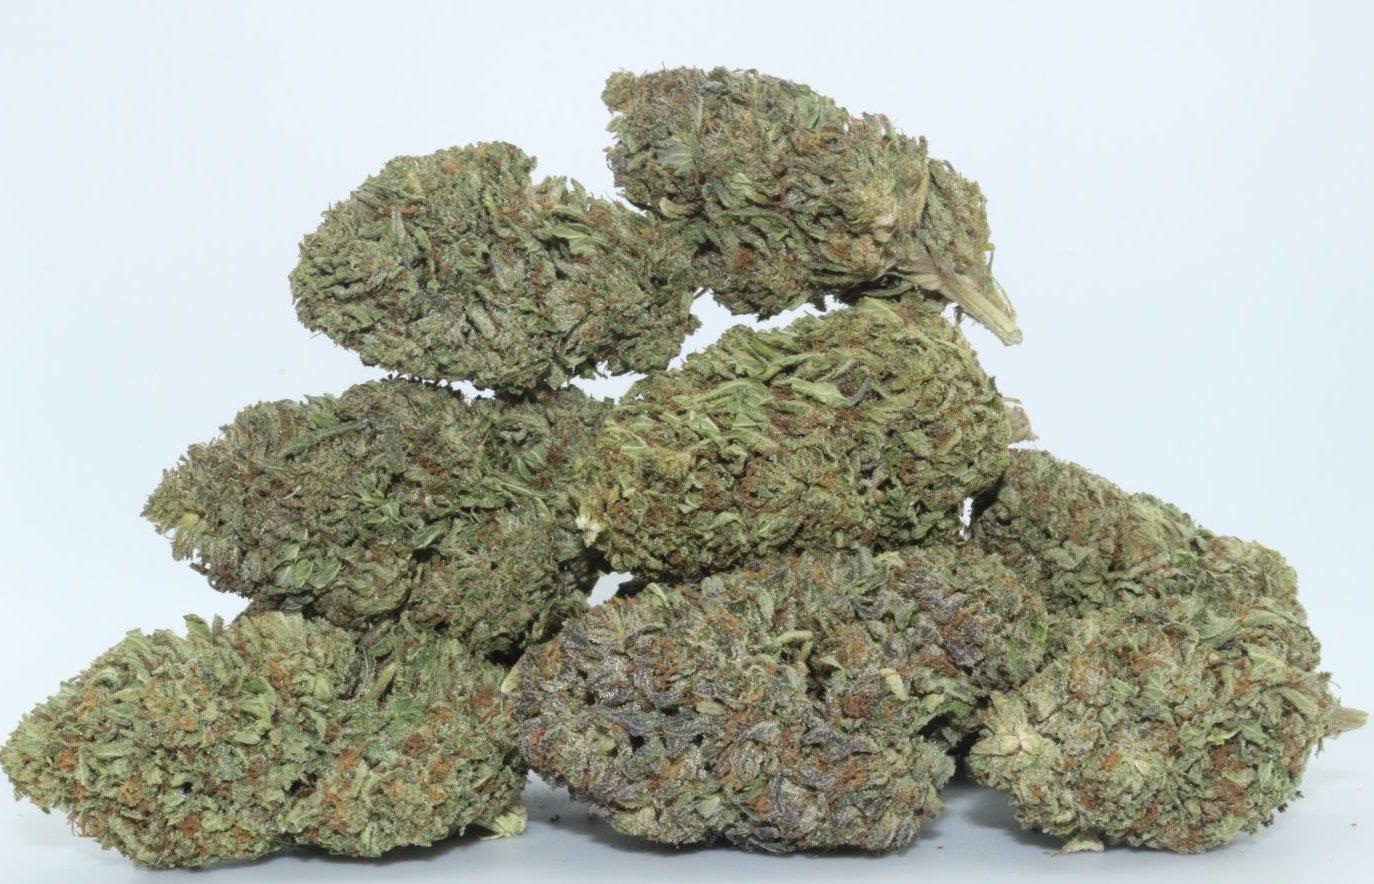 ACDC Brand Marijuana